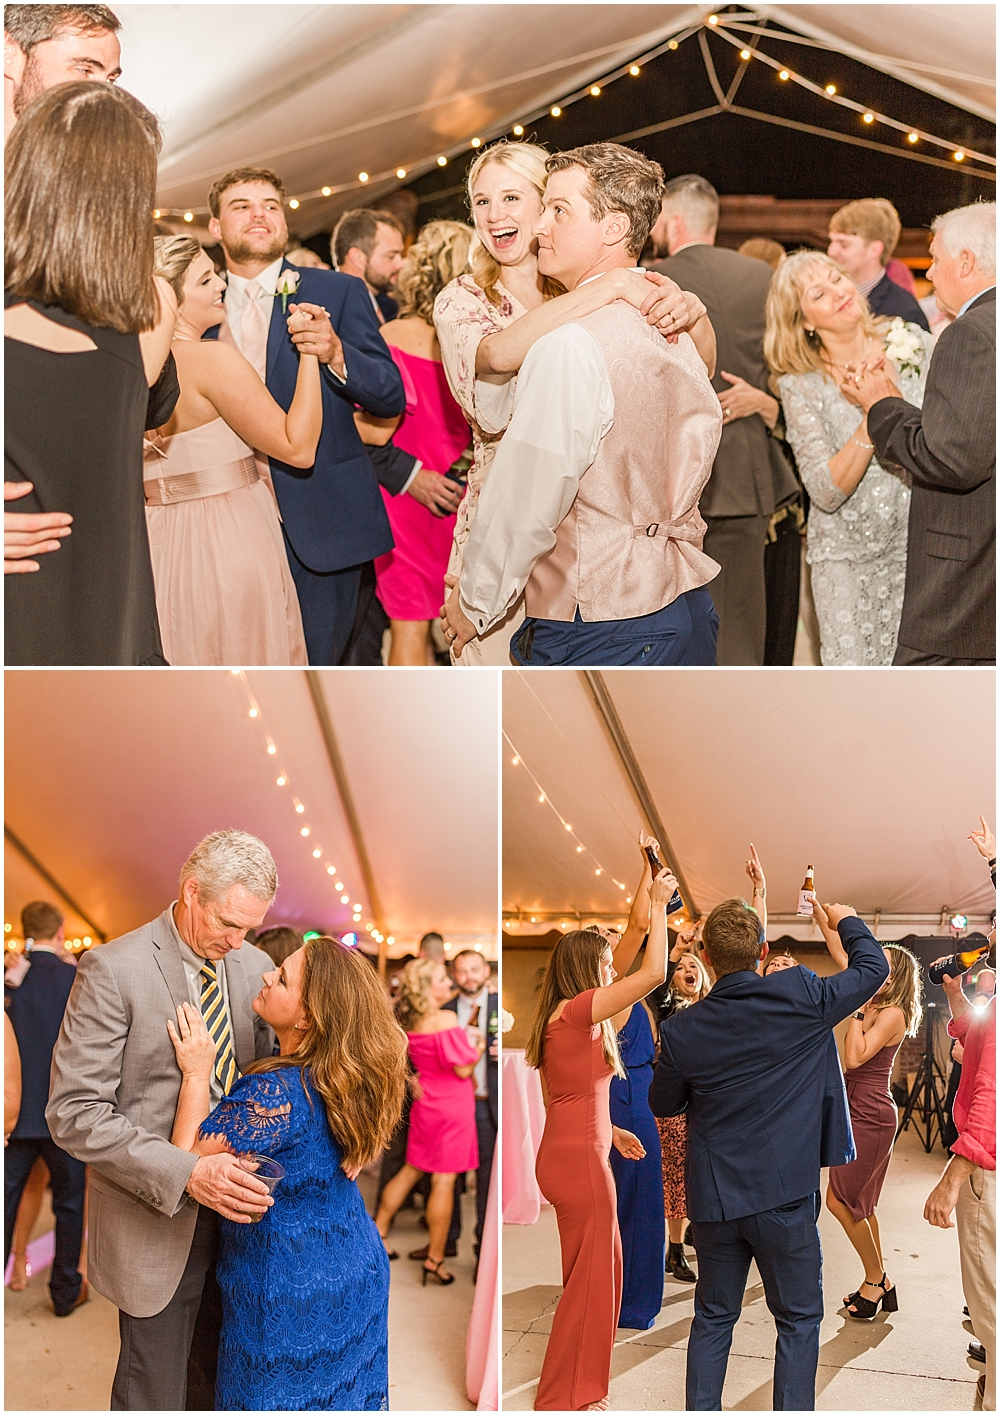 Ashton-Clark-Photography-Wedding-Portrait-Family-Photographer-Mobile-Alabama_0373.jpg